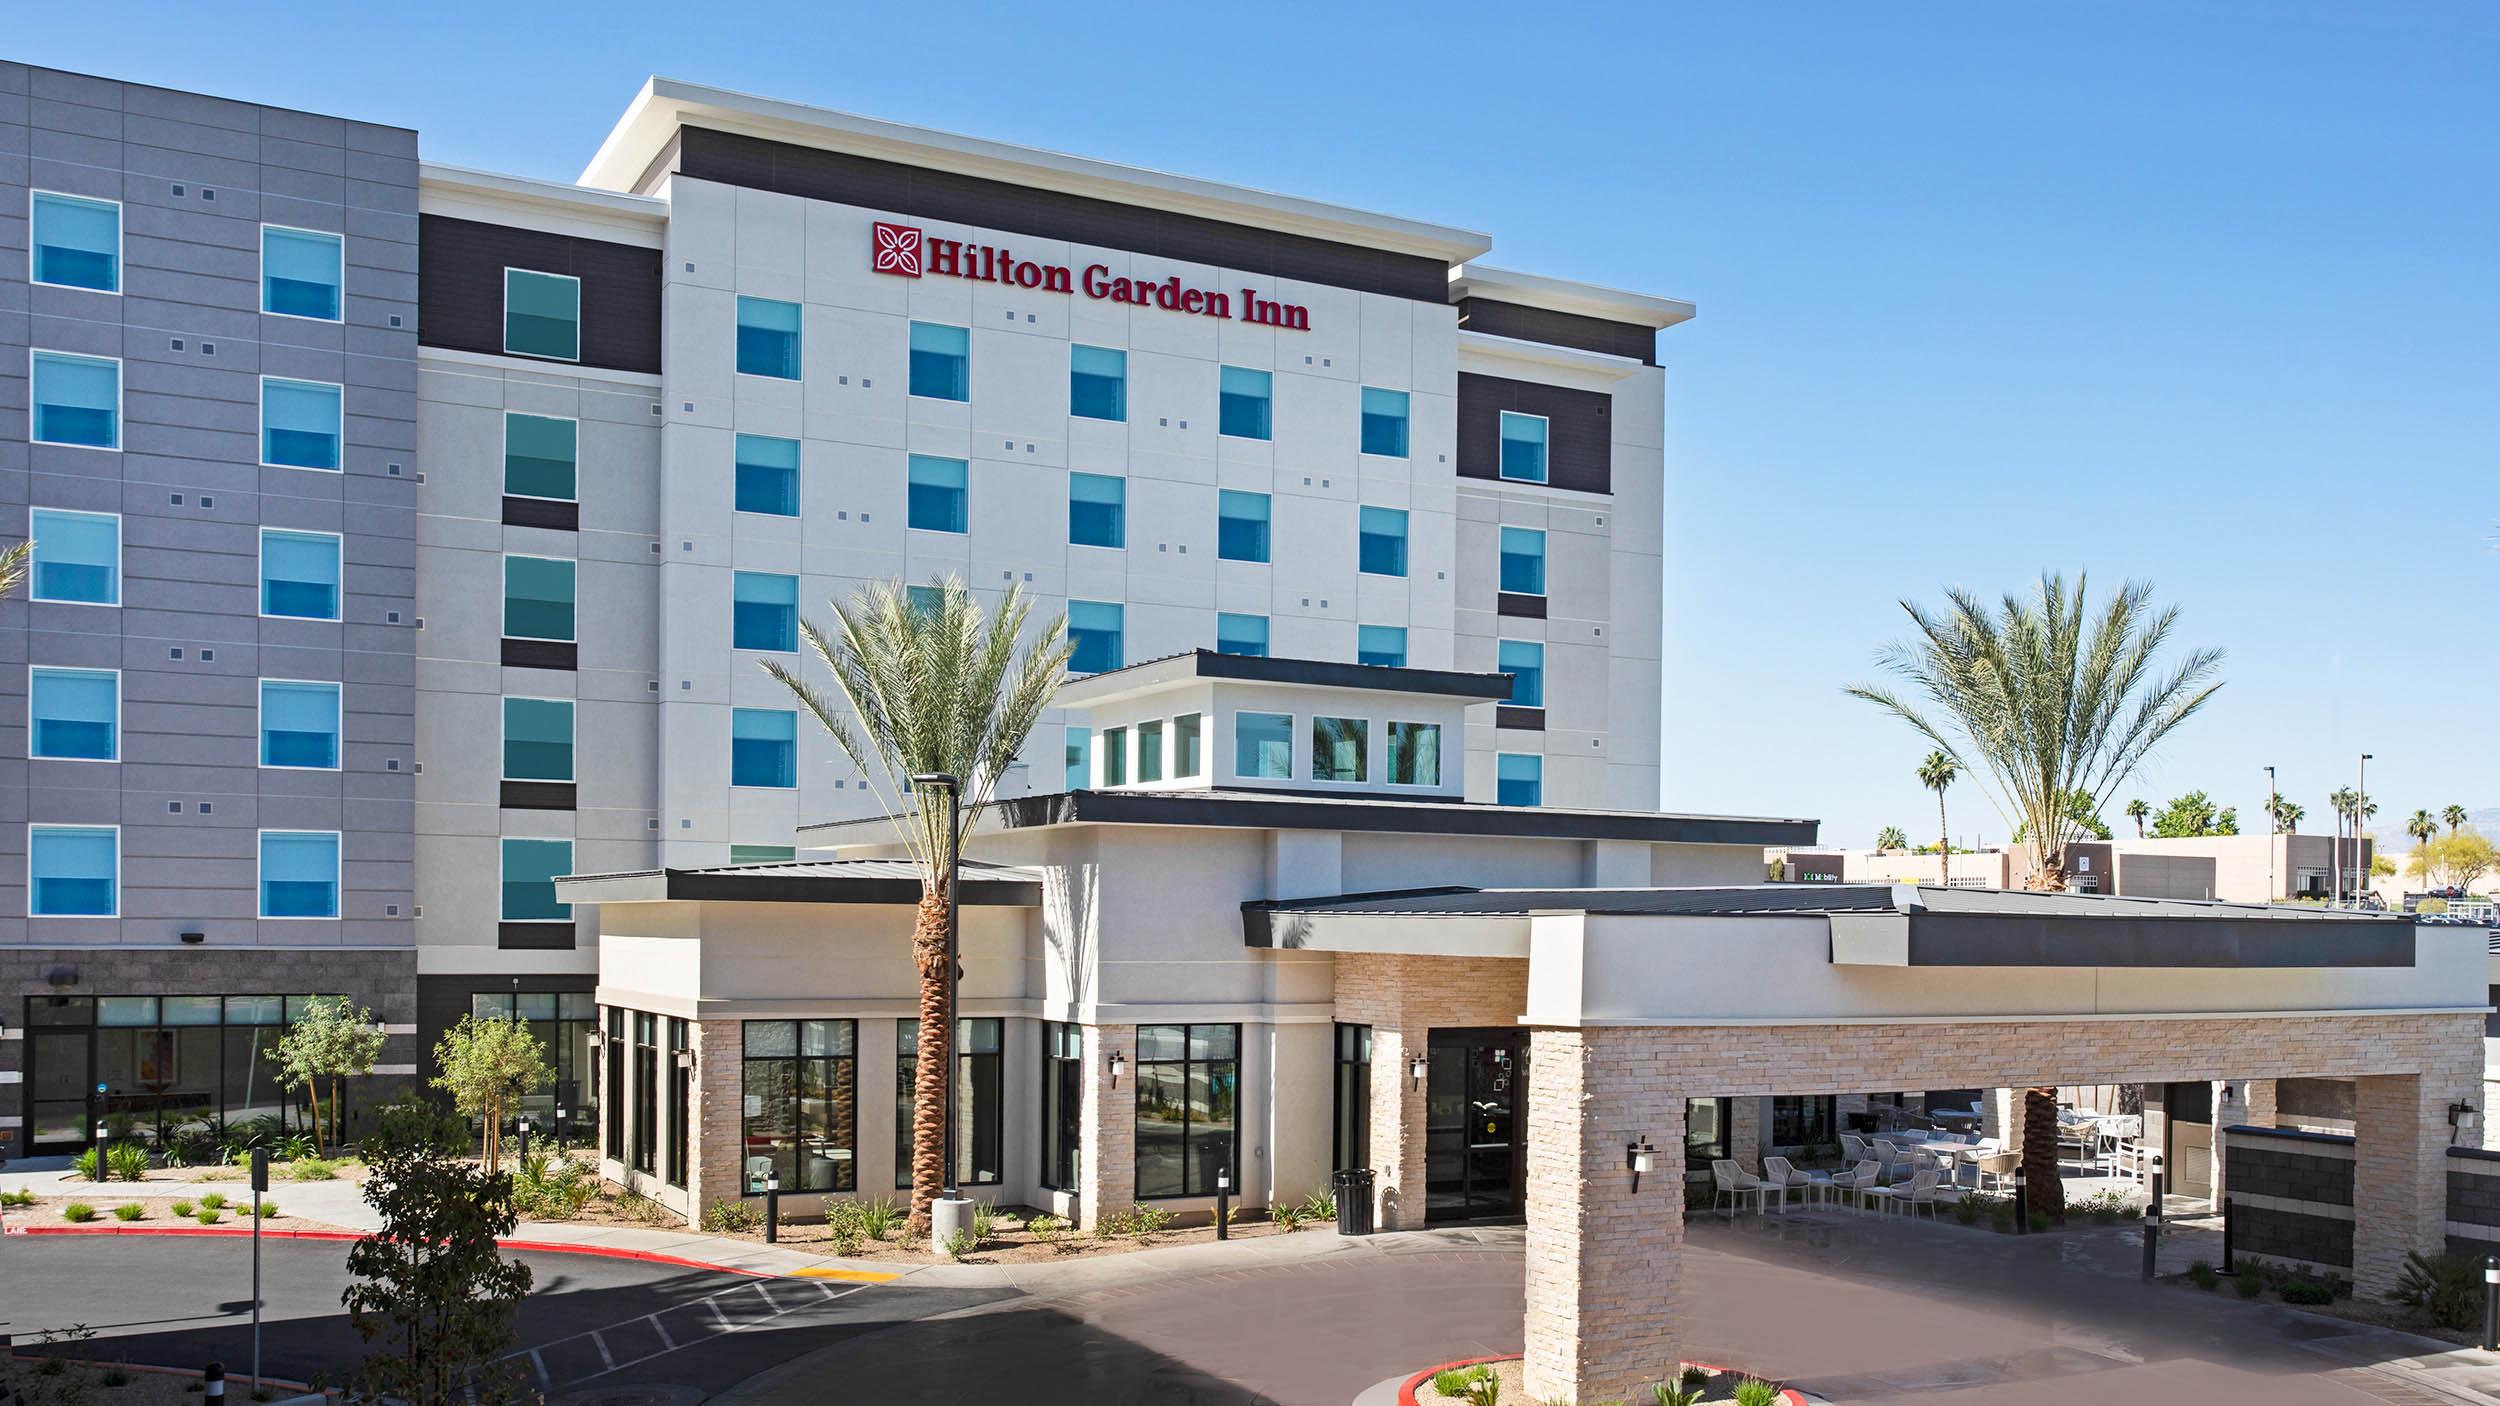 LASLGGI Hilton Garden Inn Las Vegas Exterior Day 2500.jpg